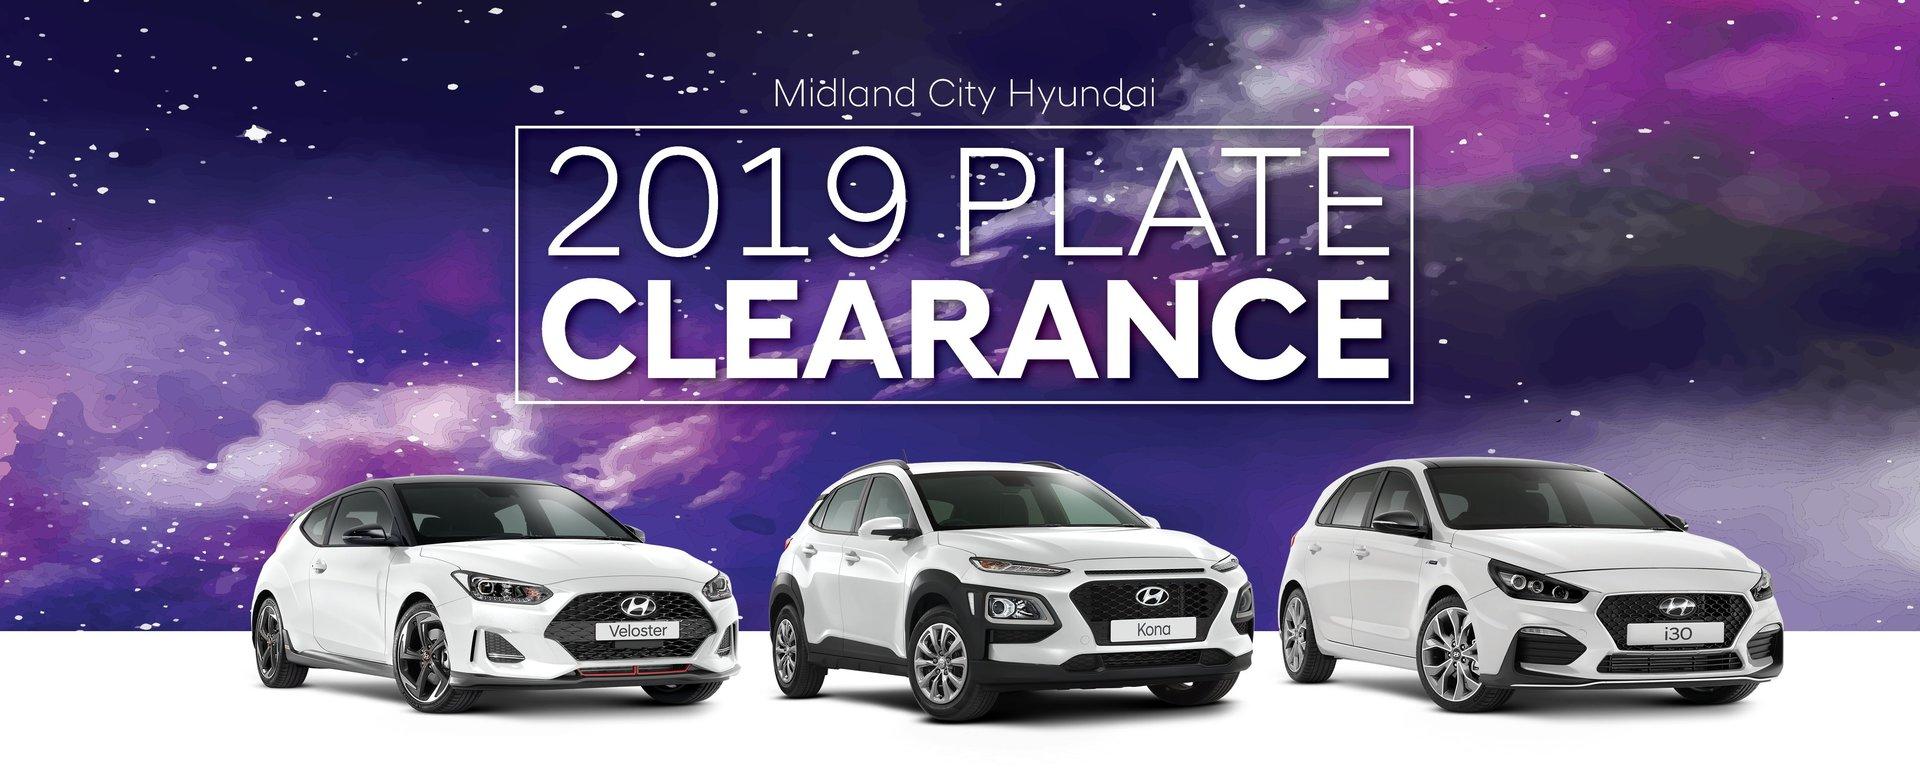 Plate Clearance Sale